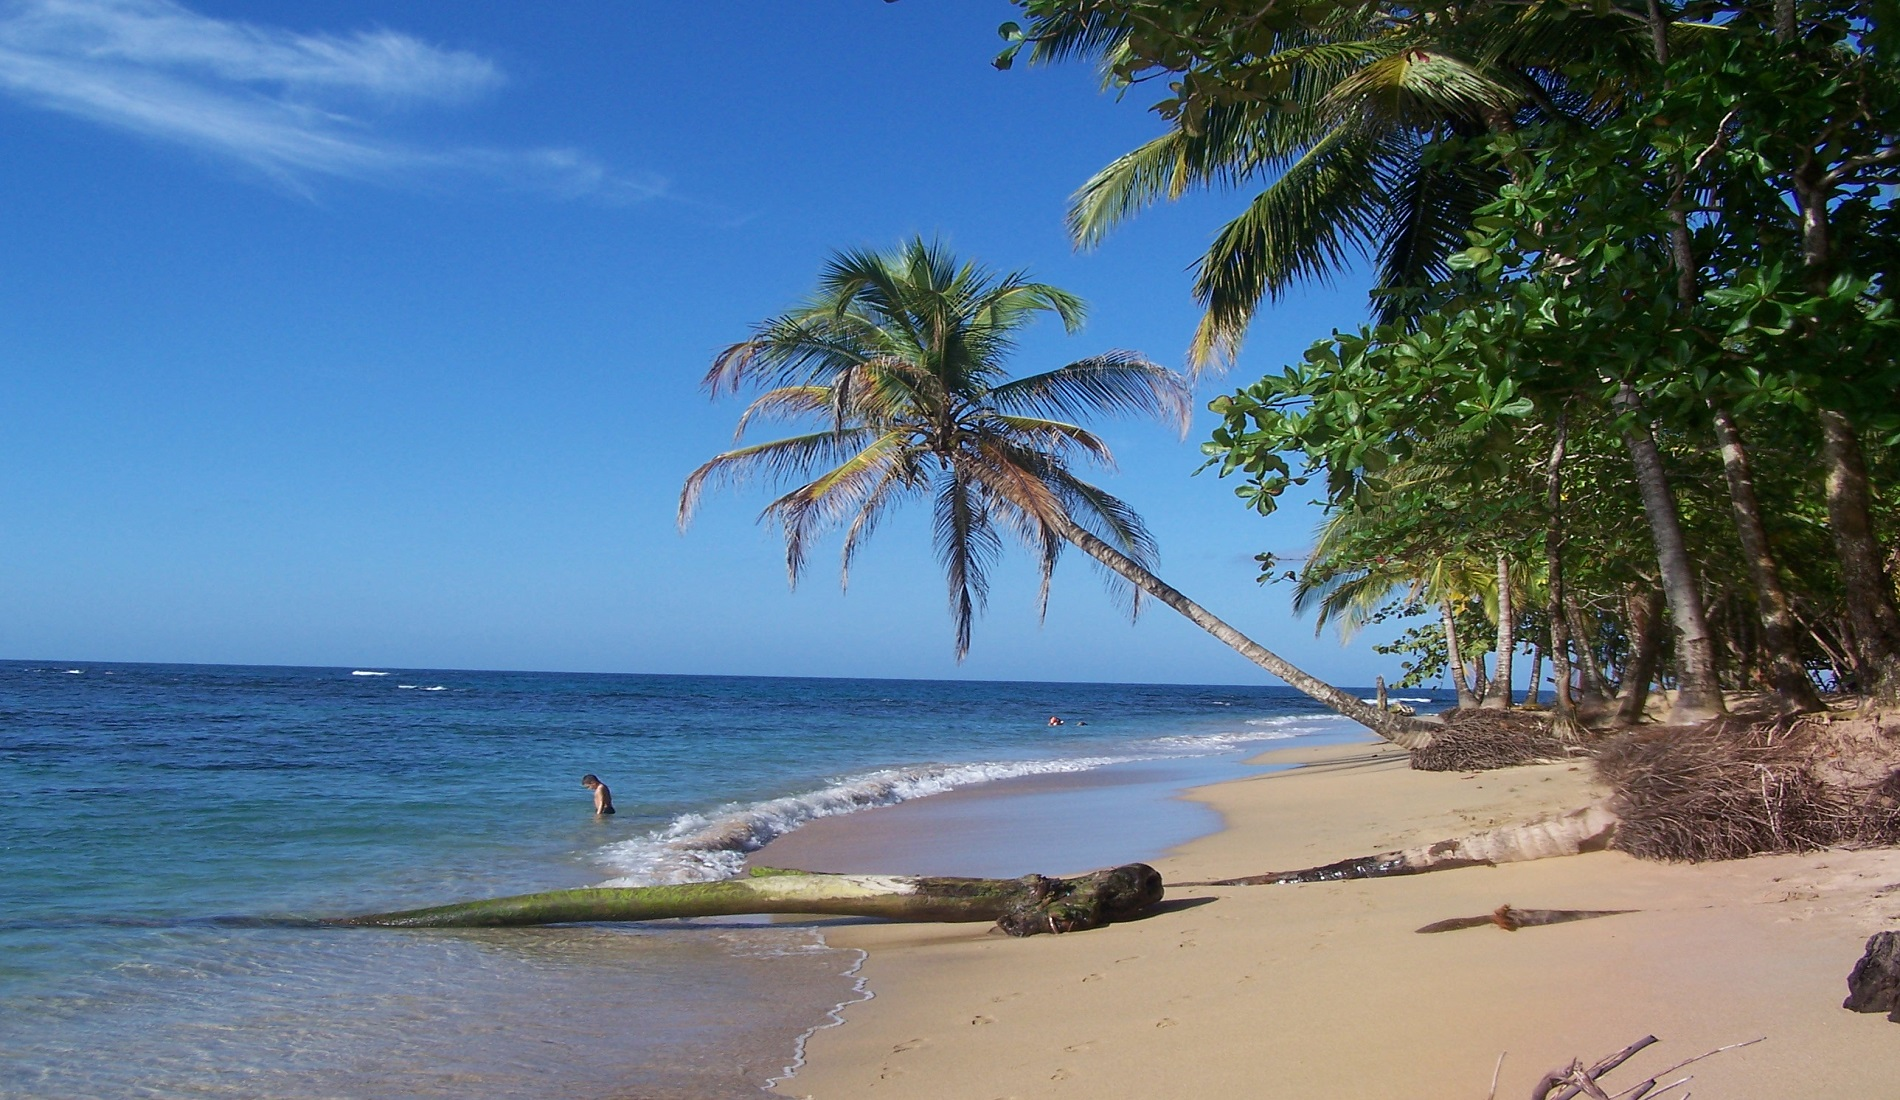 Arrecife beach